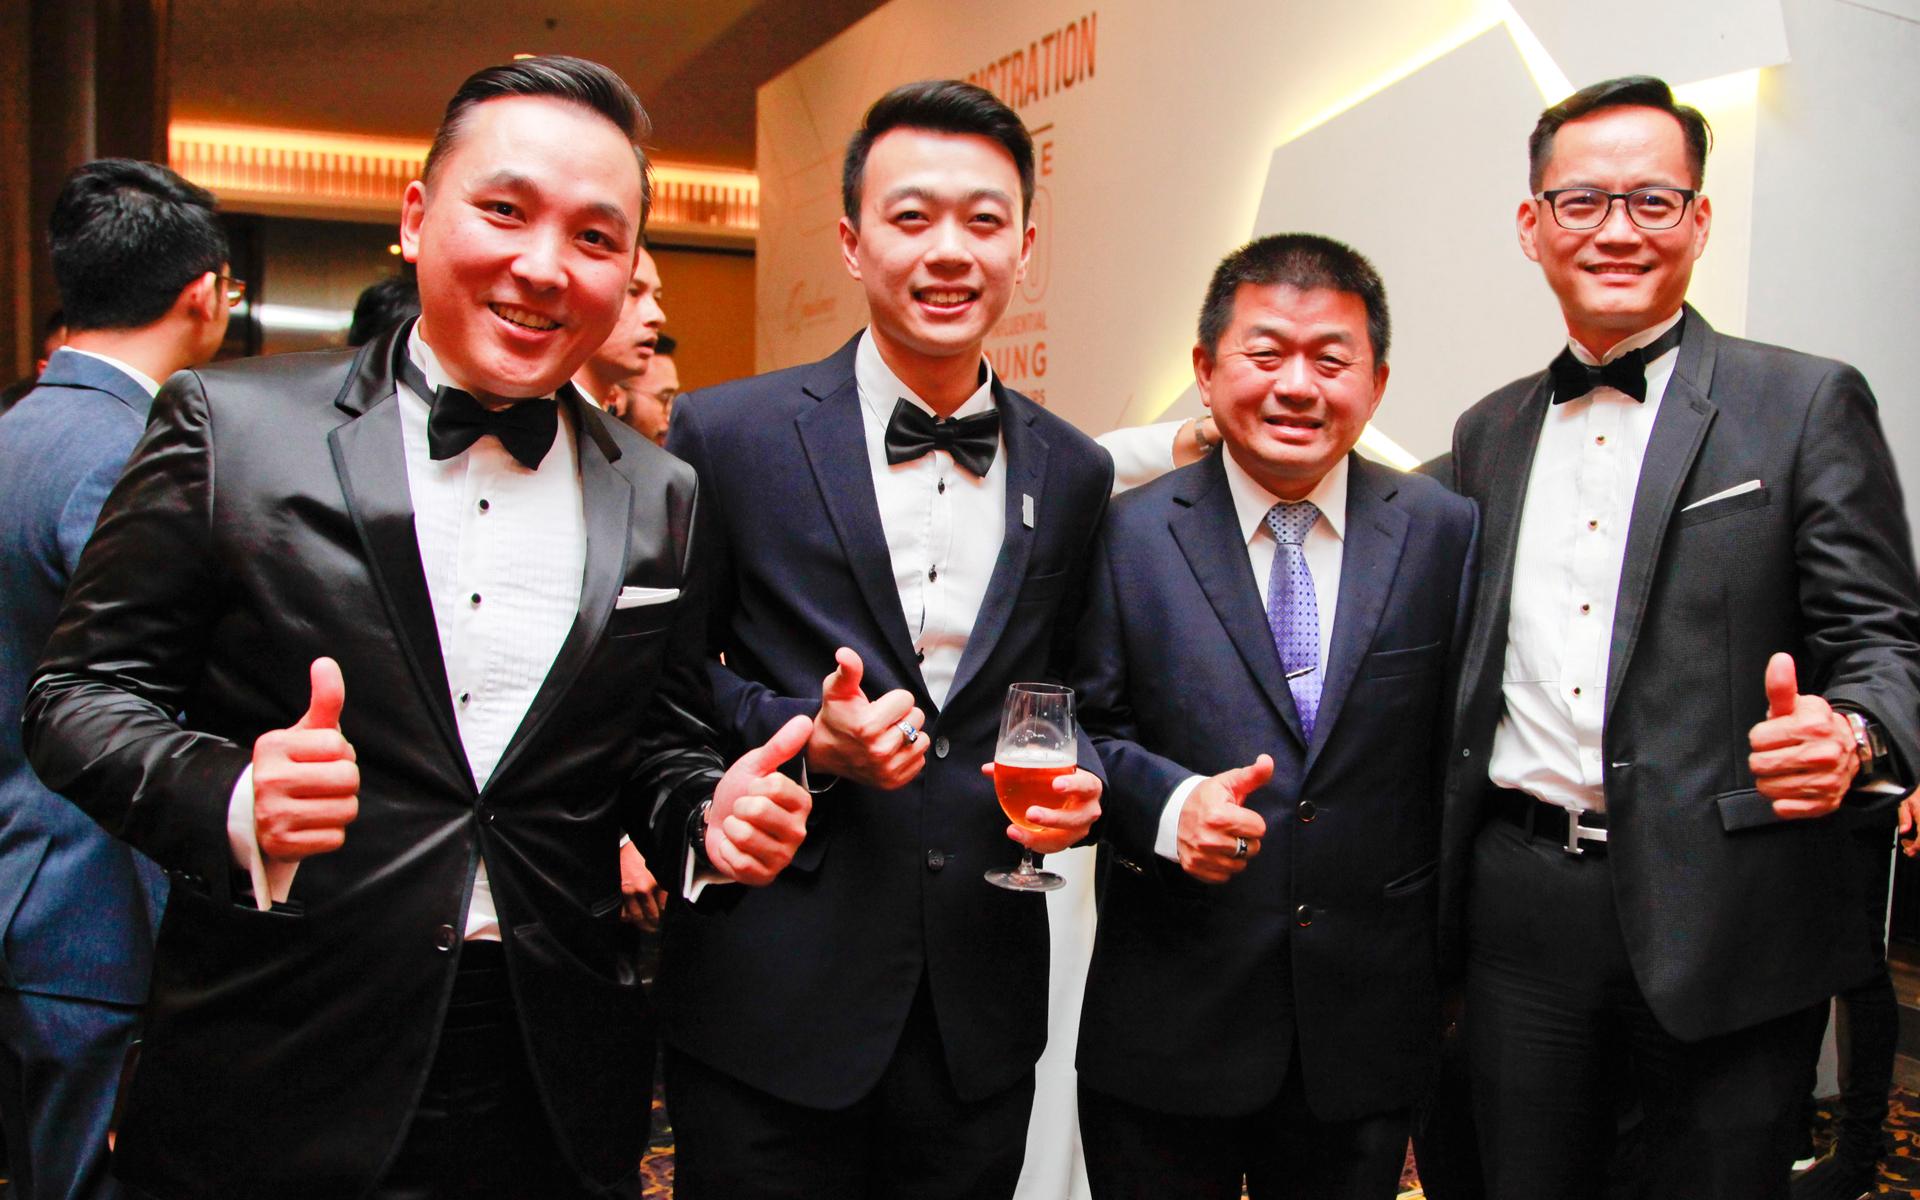 Francis Pua Siong Foo, Elvis Thoo, Dato' Thoo and Joe Yew